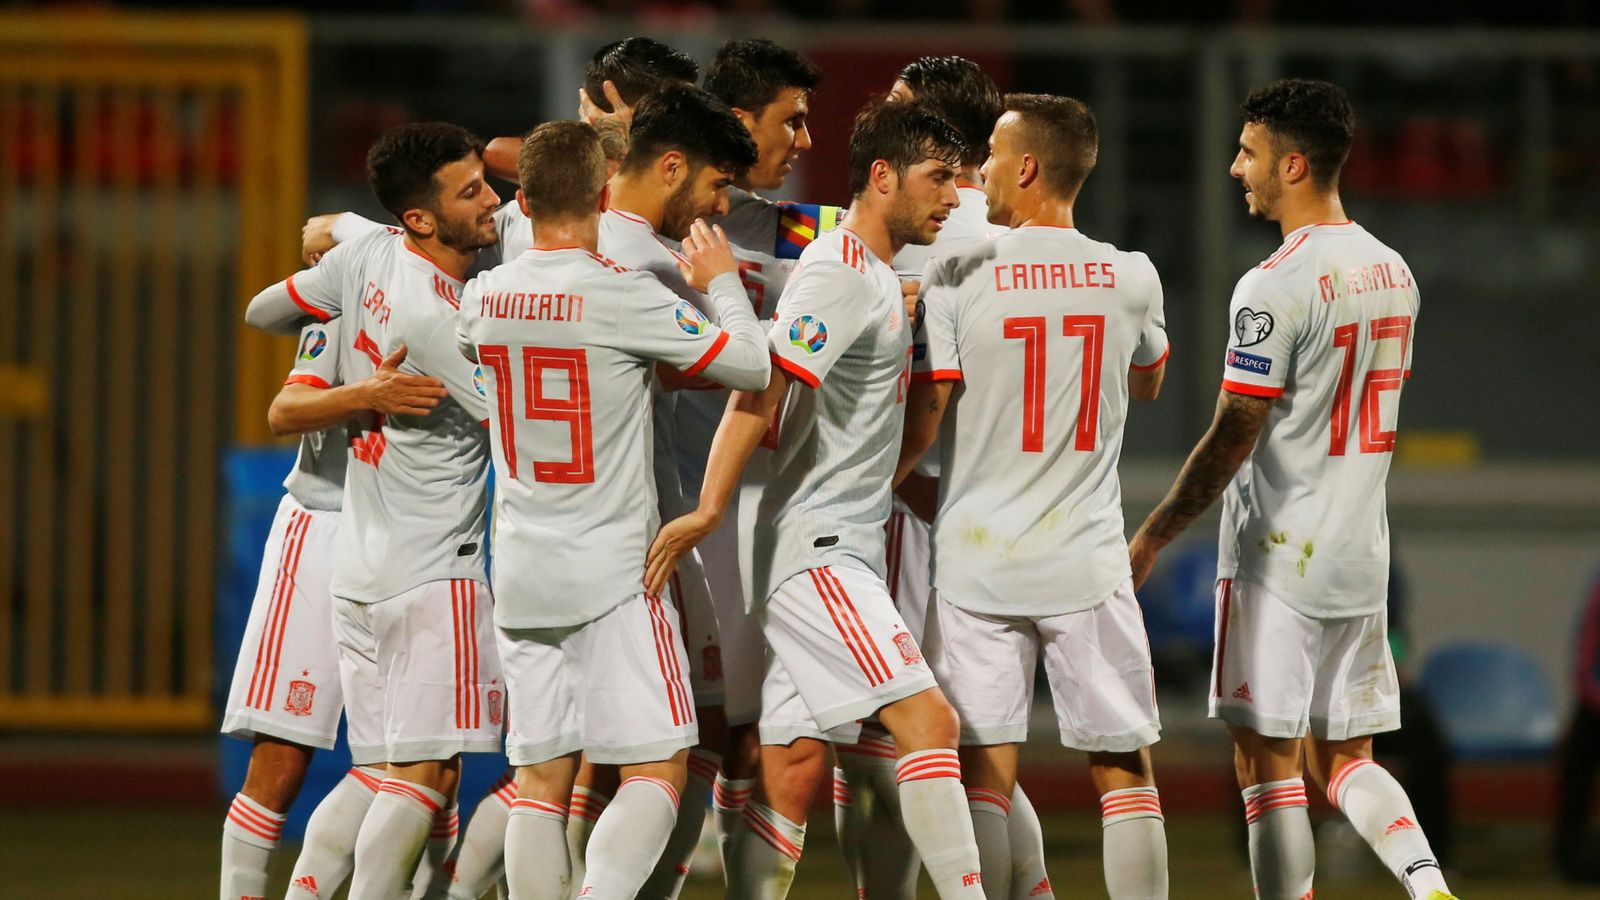 Foto: Euro 2020 qualifier - group f - malta v spain